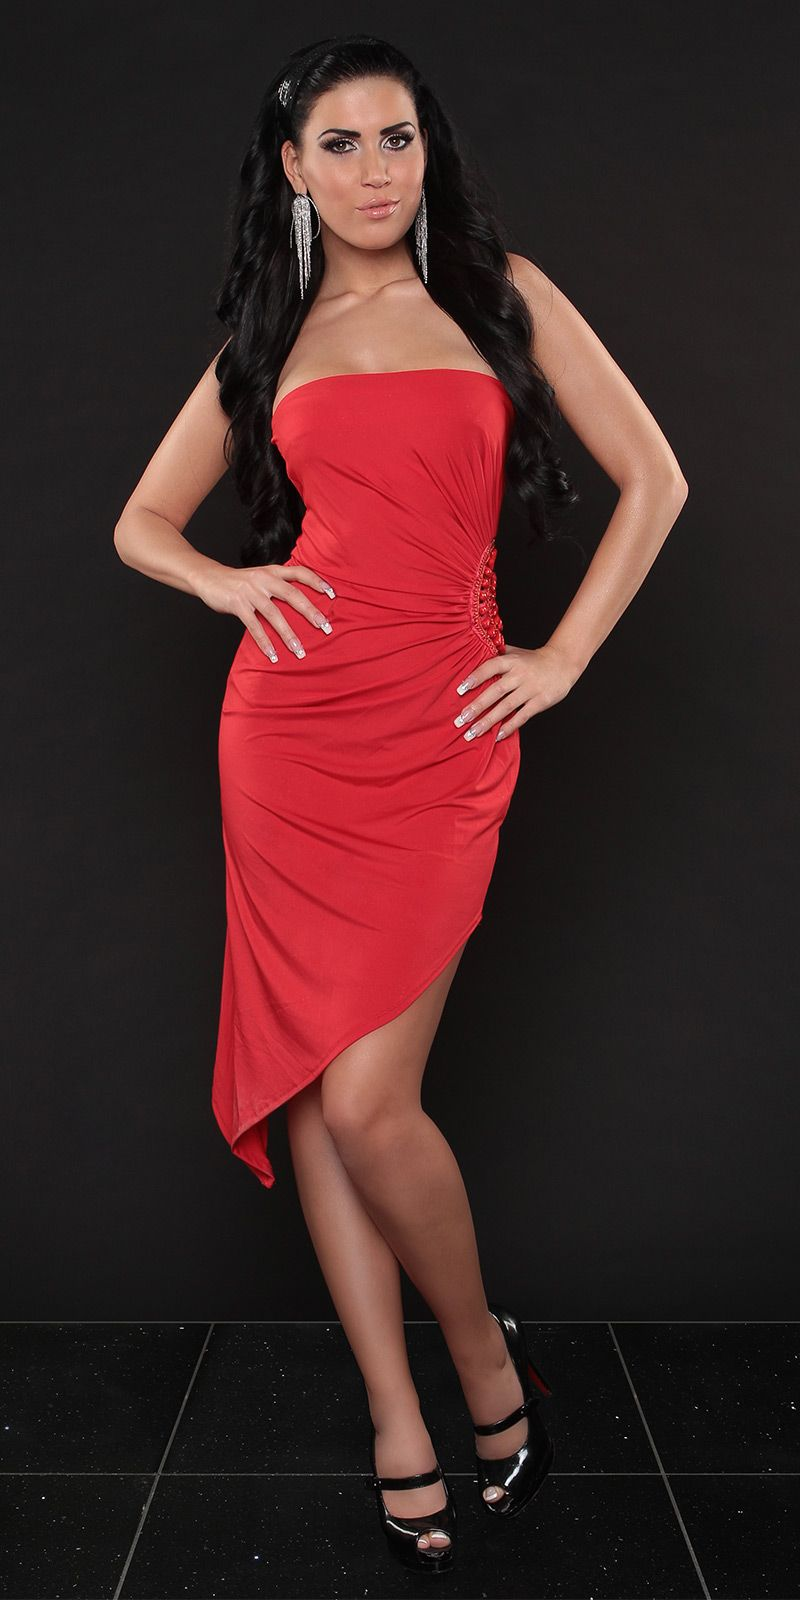 Red dress $40